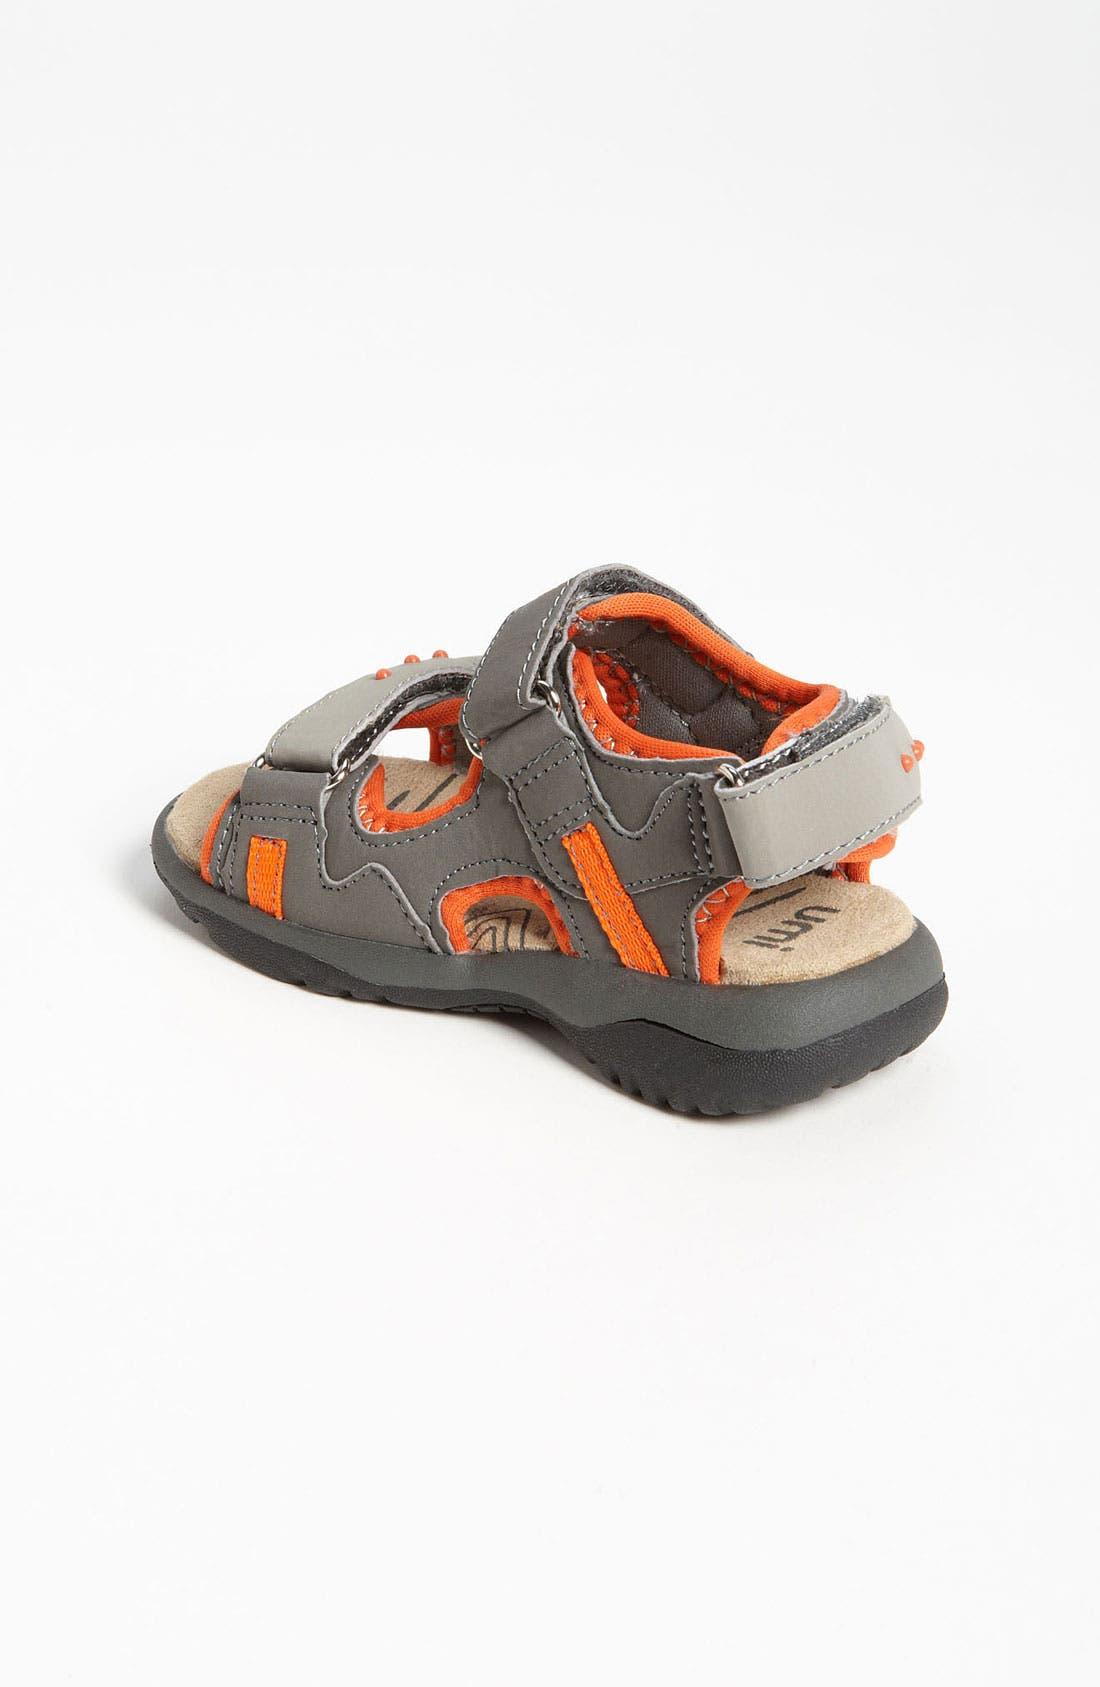 Alternate Image 2  - Umi 'Laren' Sandal (Walker, Toddler, Little Kid & Big Kid)